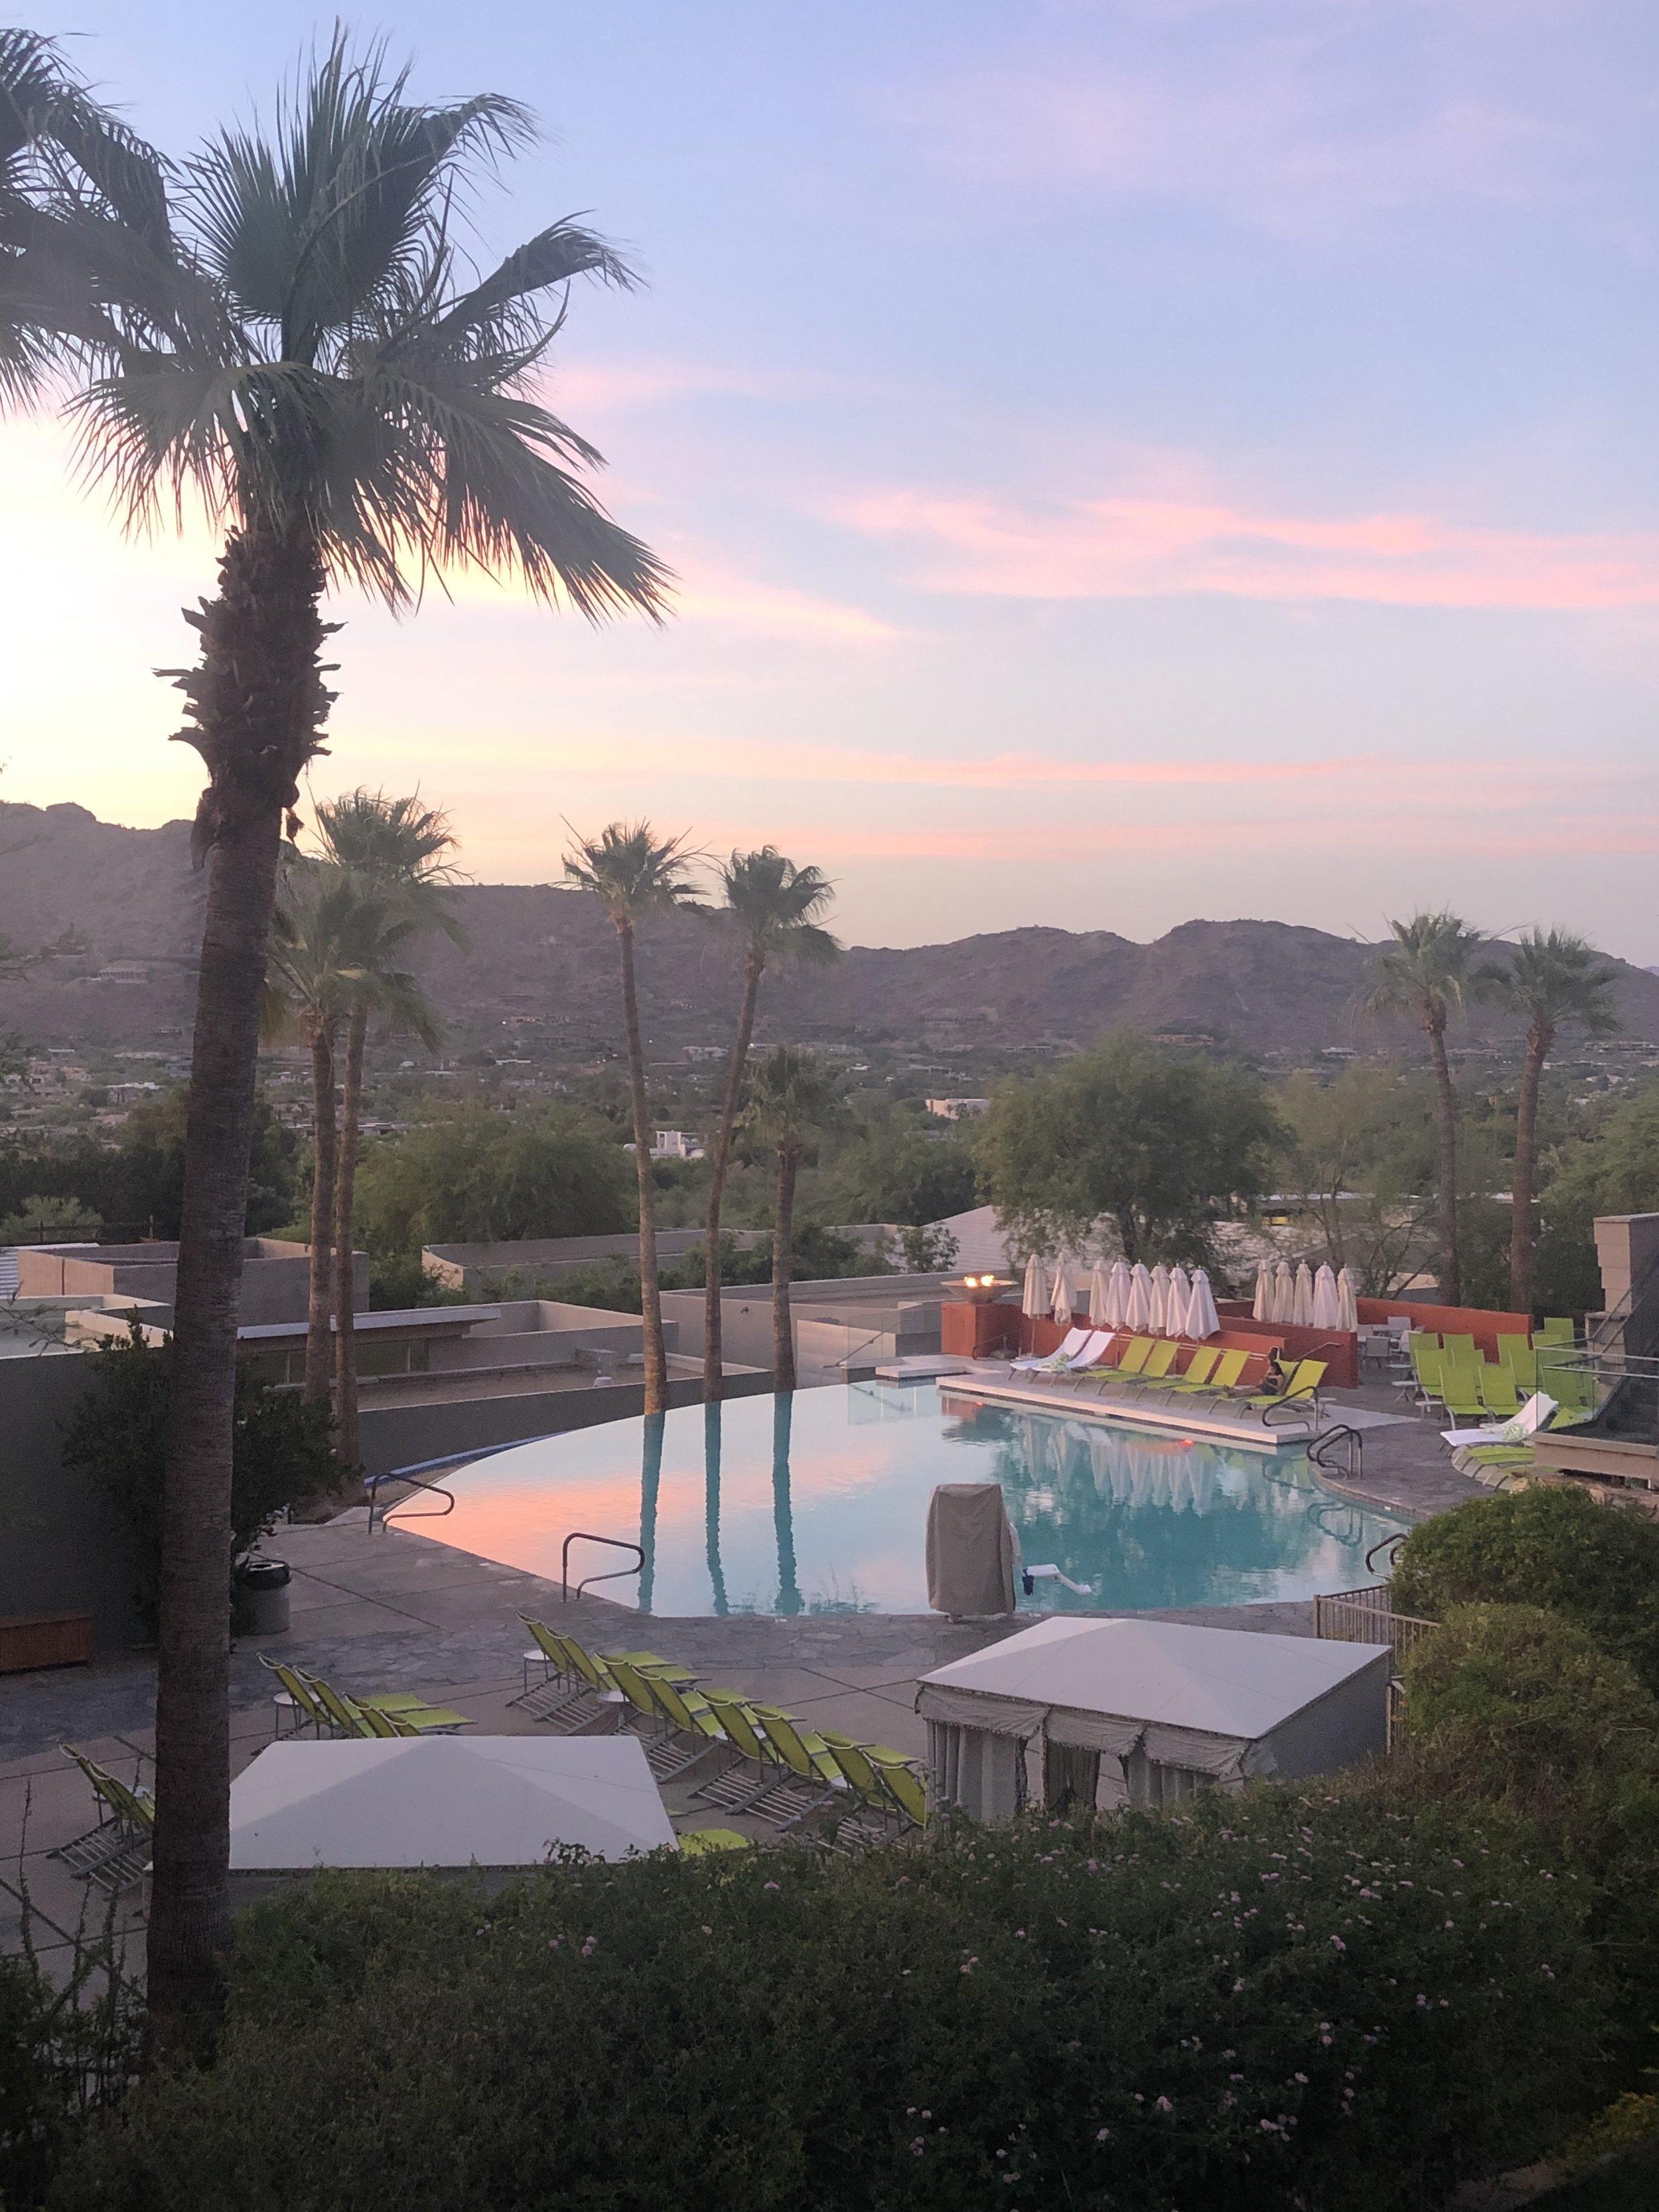 Wanderlust-travel-blog-sanctuary-camelback-resort-spa-arizona